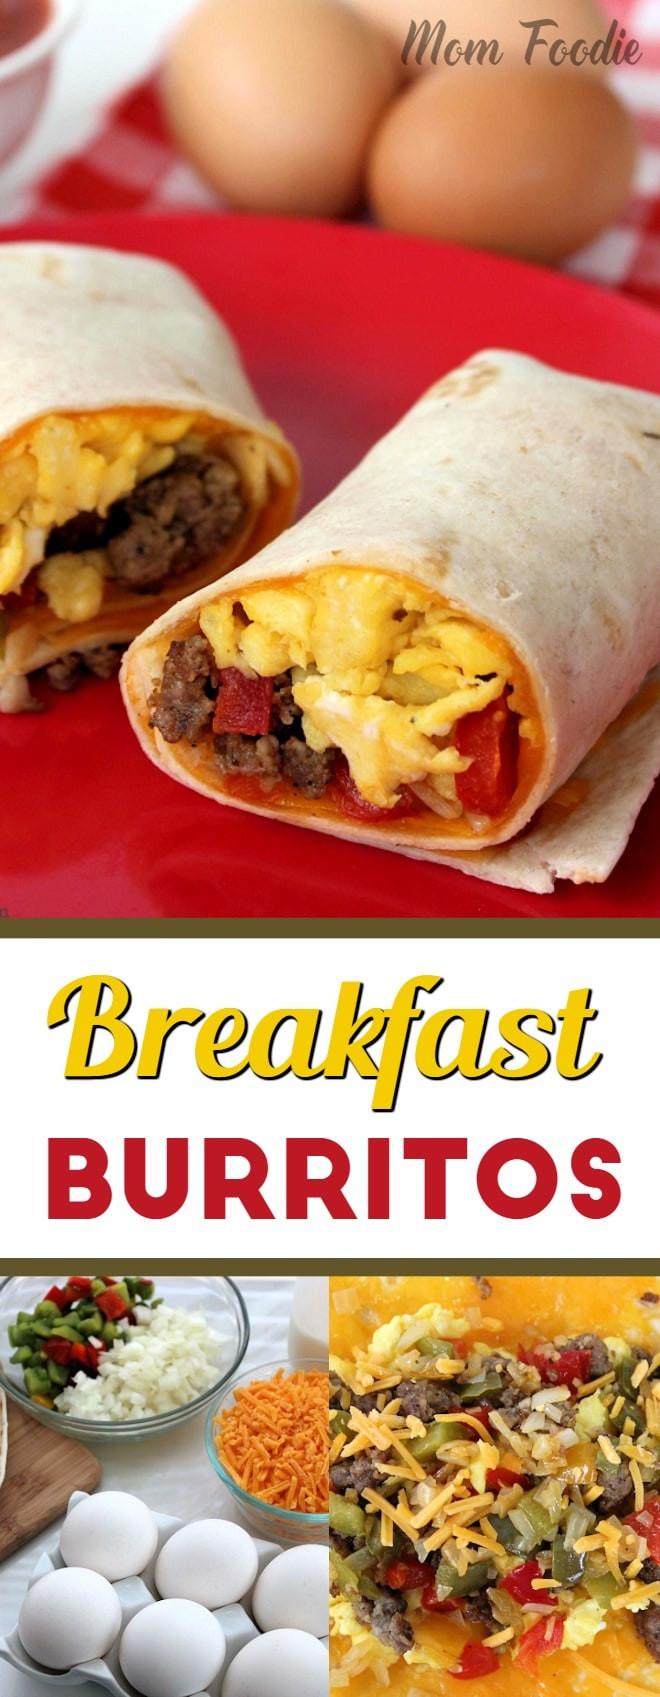 Breakfast Burrito Recipe Easy  Breakfast Burritos Easy Breakfast Recipe Mom Foo